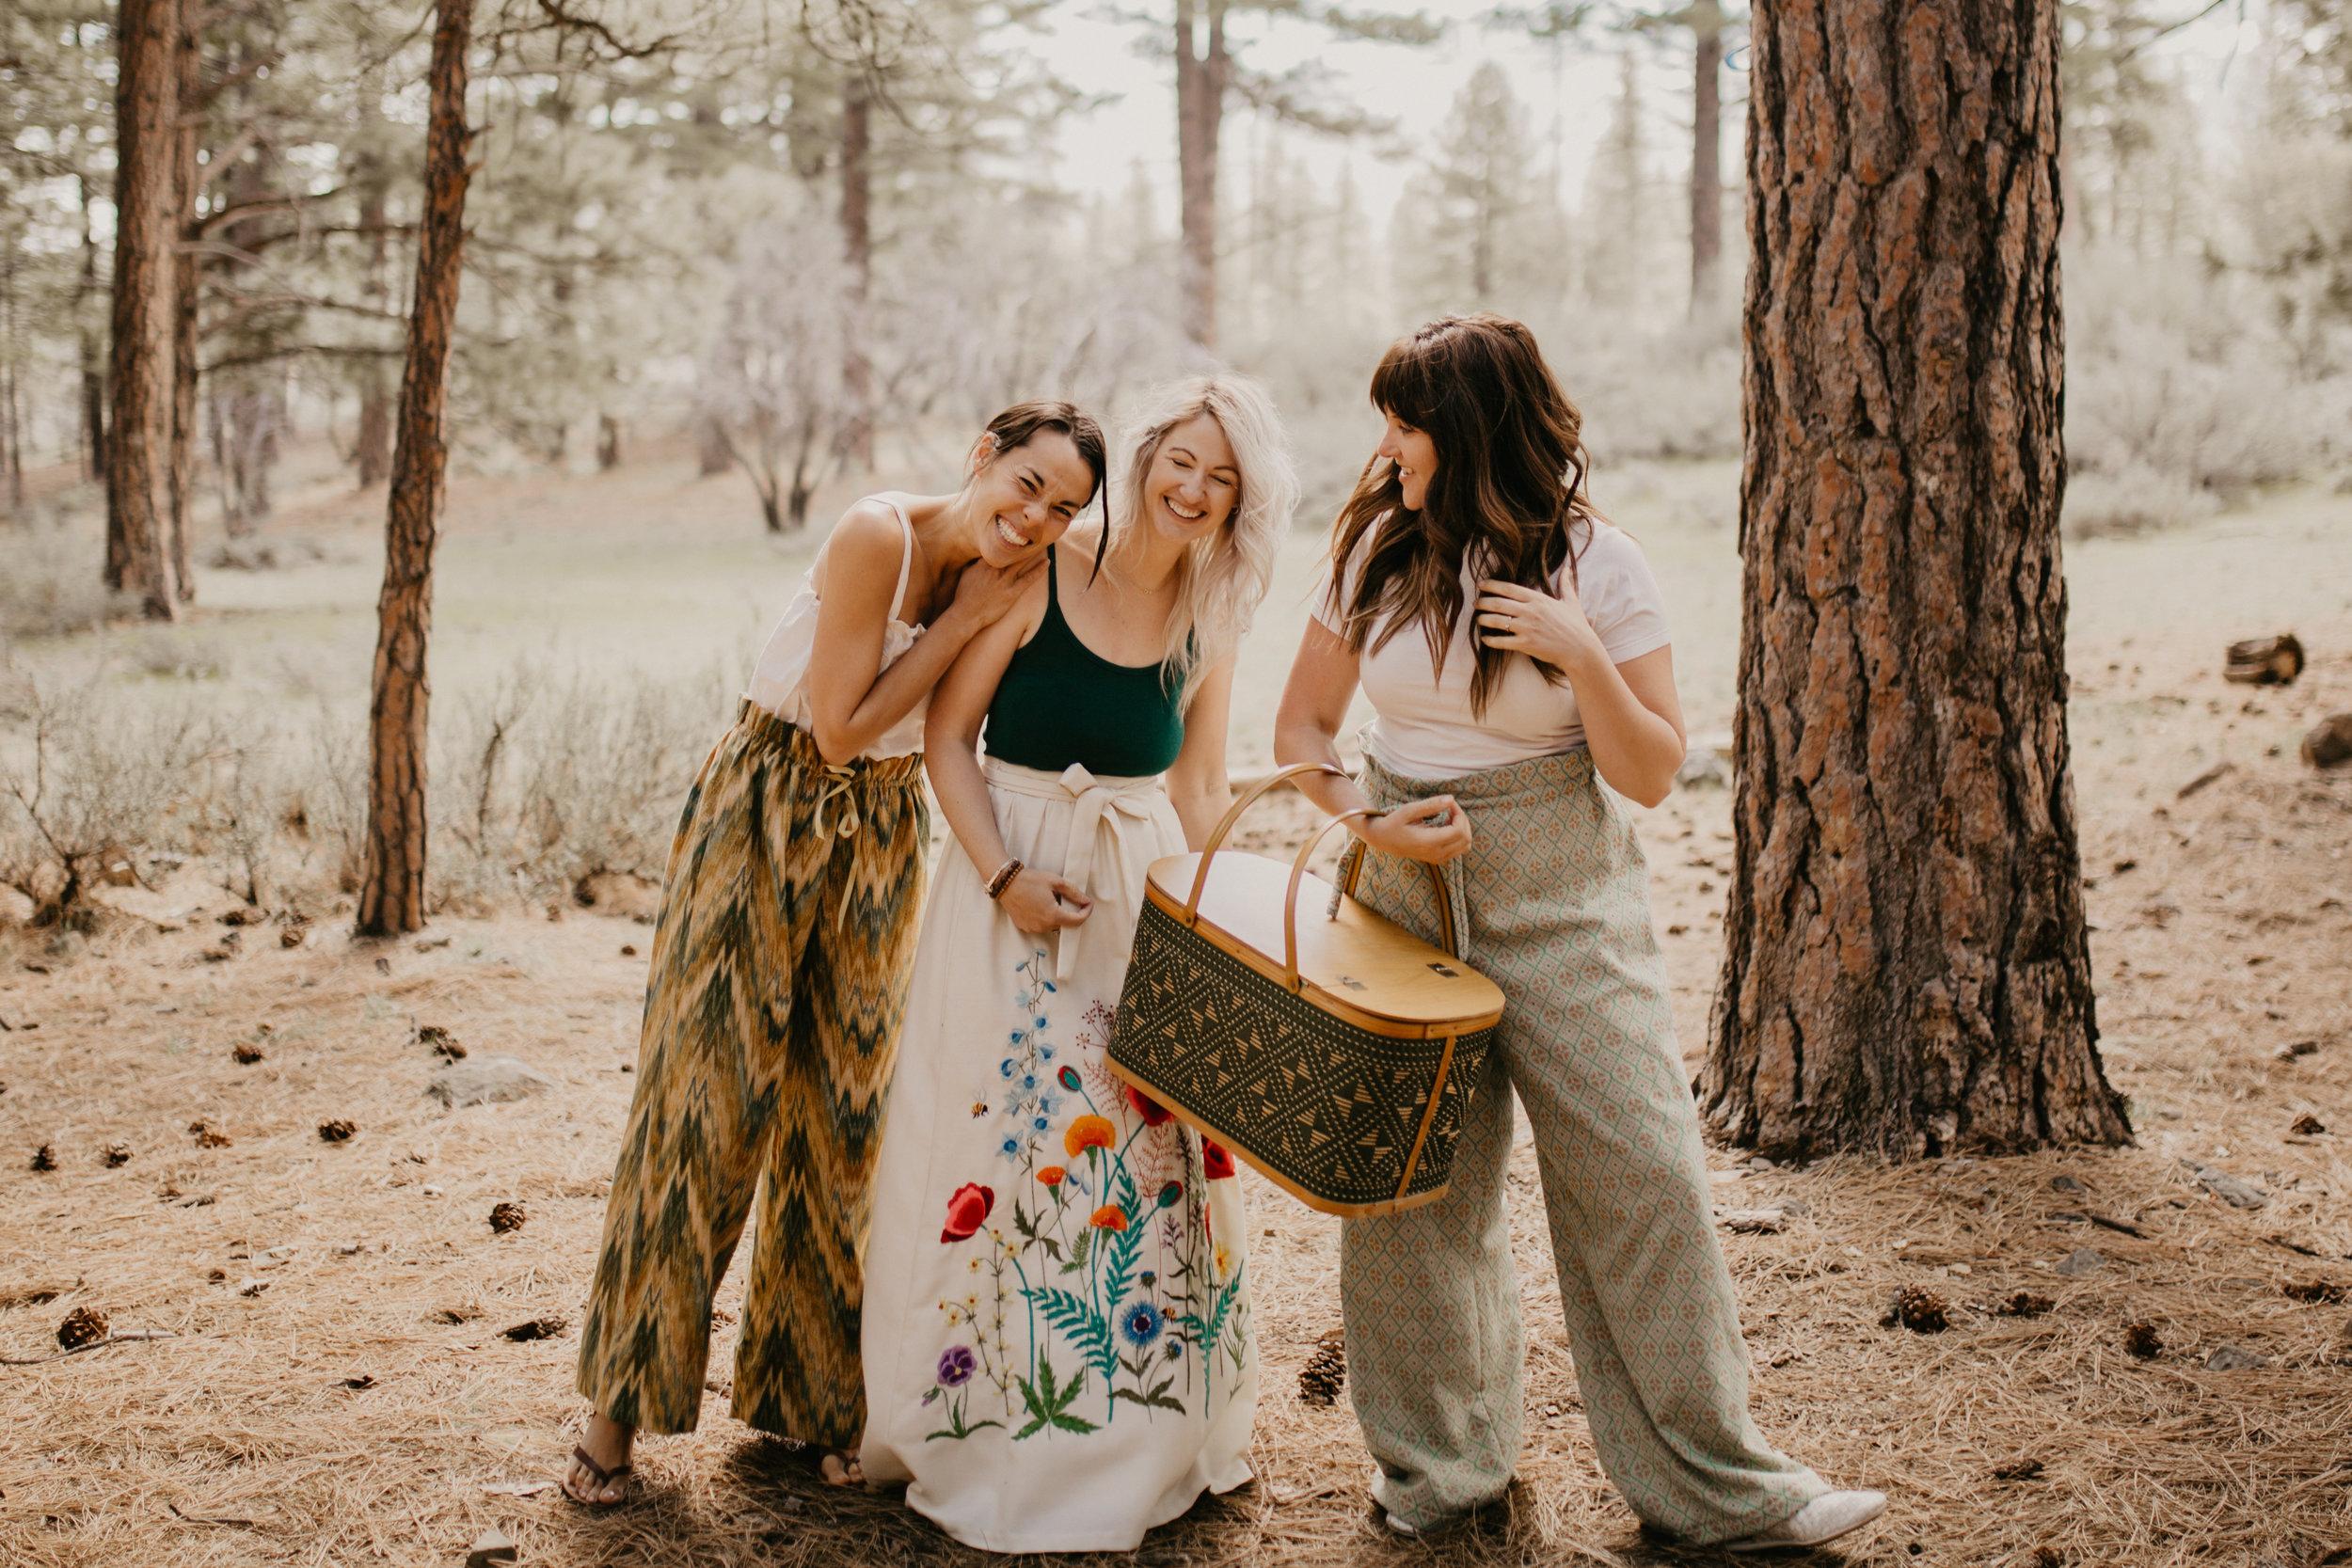 The Nest Vintage Picnic Girlfriends